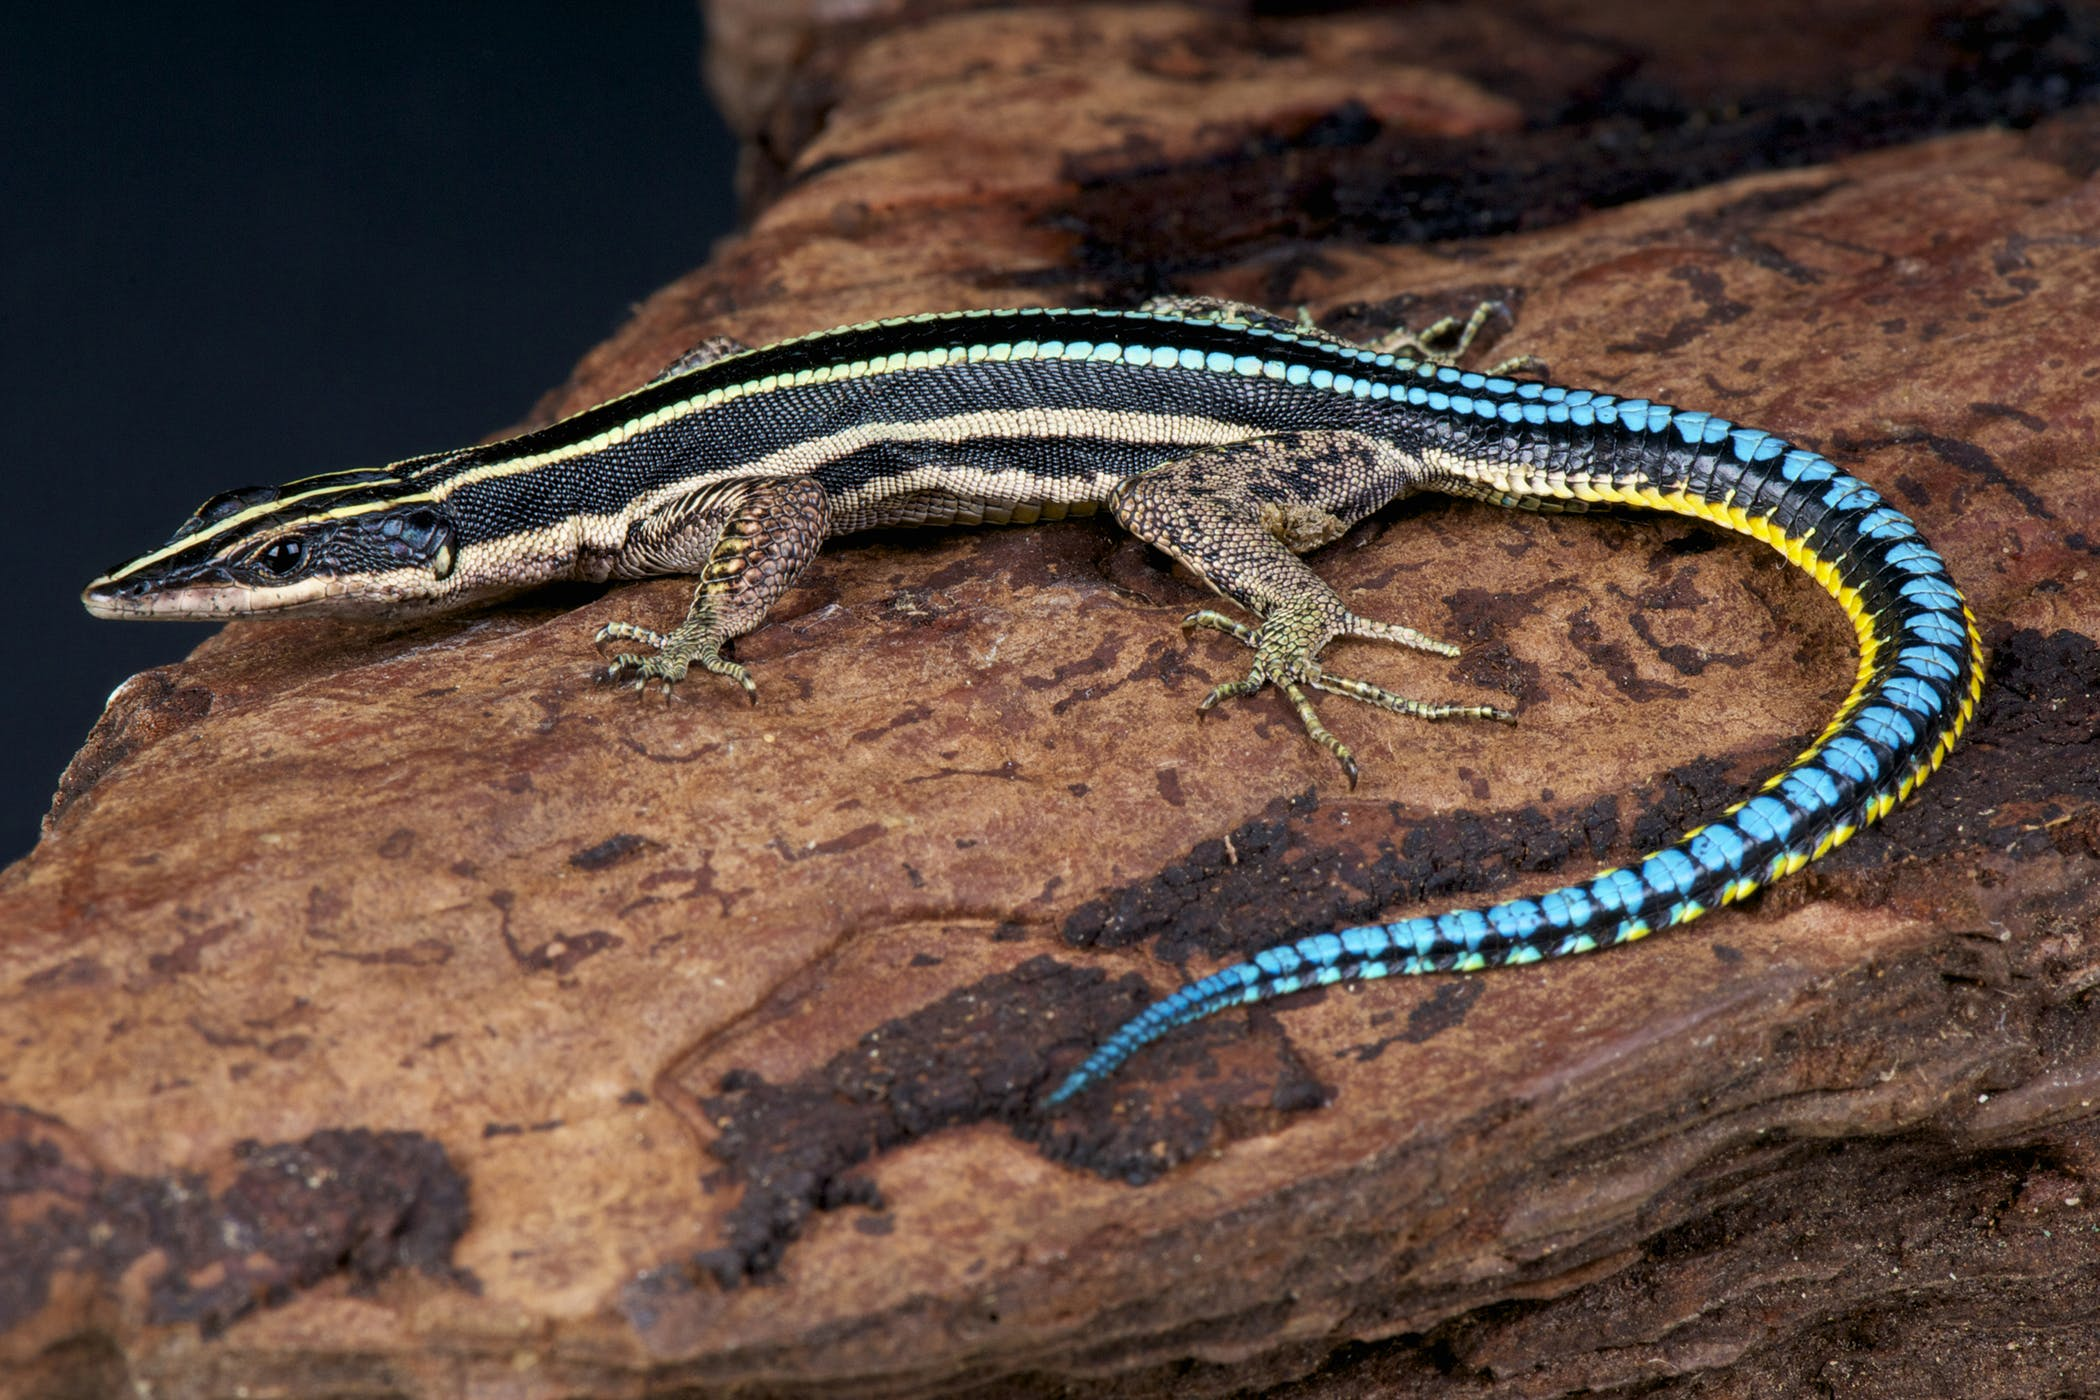 Nematodes In Reptiles Symptoms Causes Diagnosis